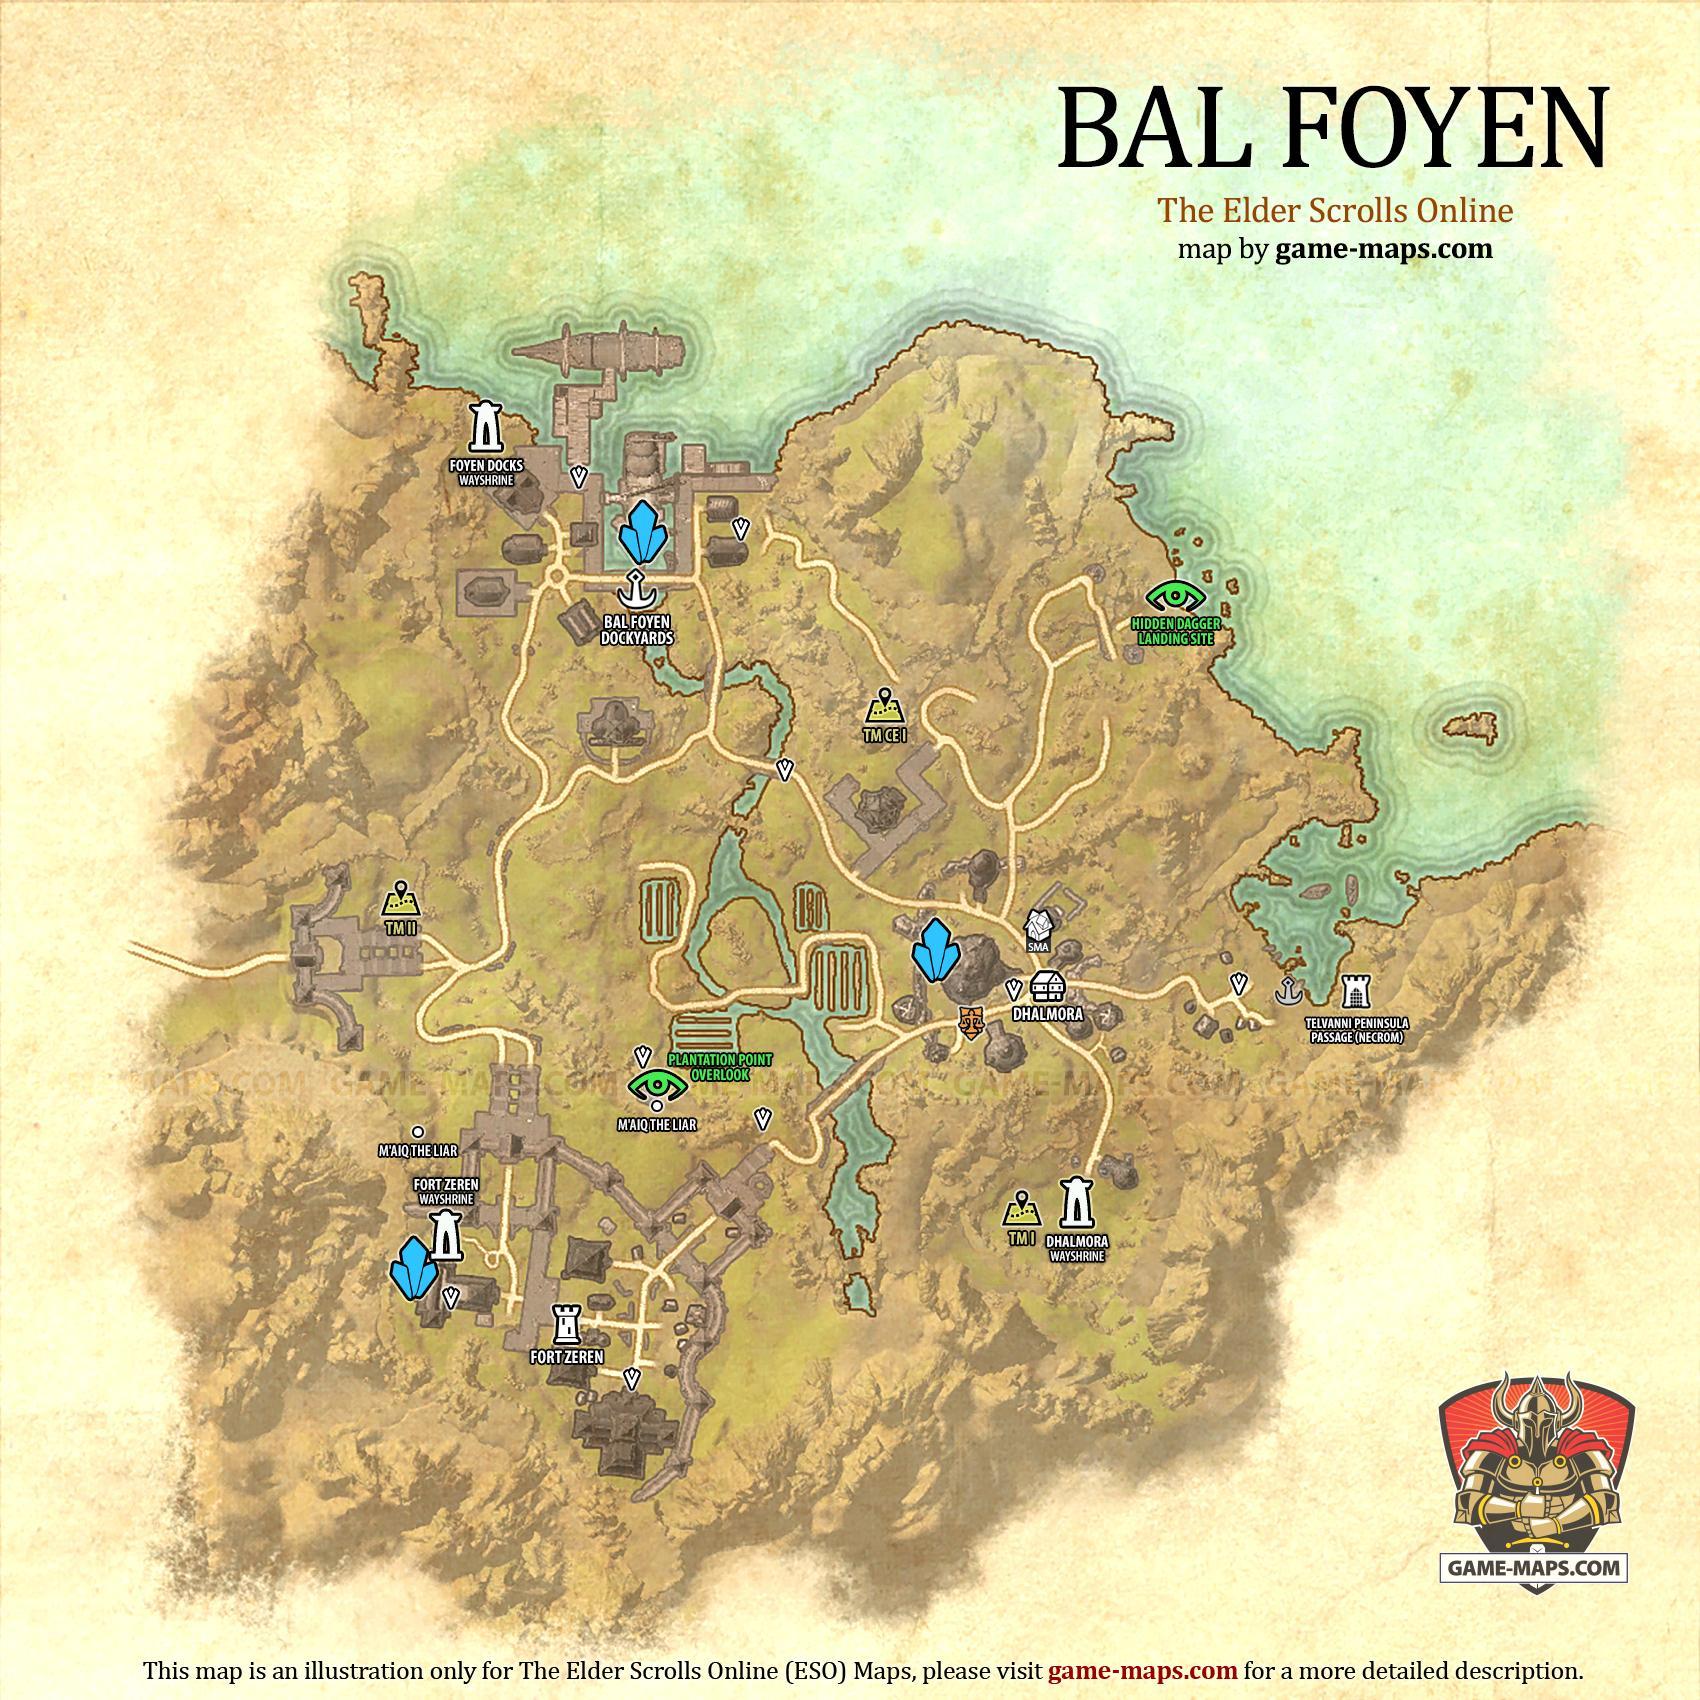 Bal foyen map the elder scrolls online game maps bal foyen zone map the elder scrolls online eso maps guides walkthroughs gumiabroncs Images